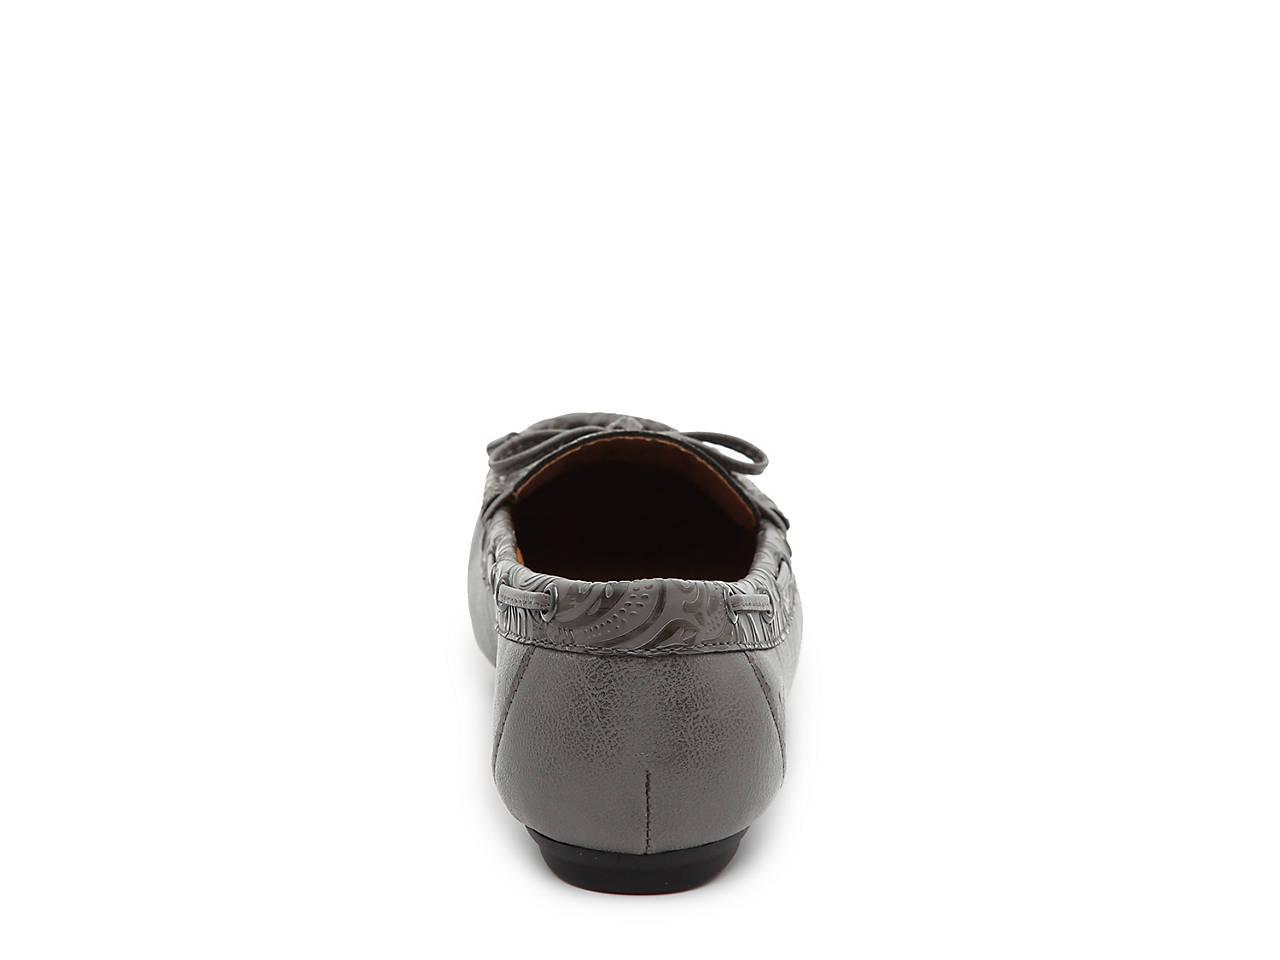 f2b2790d57a b.o.c Carolann Loafer Women s Shoes